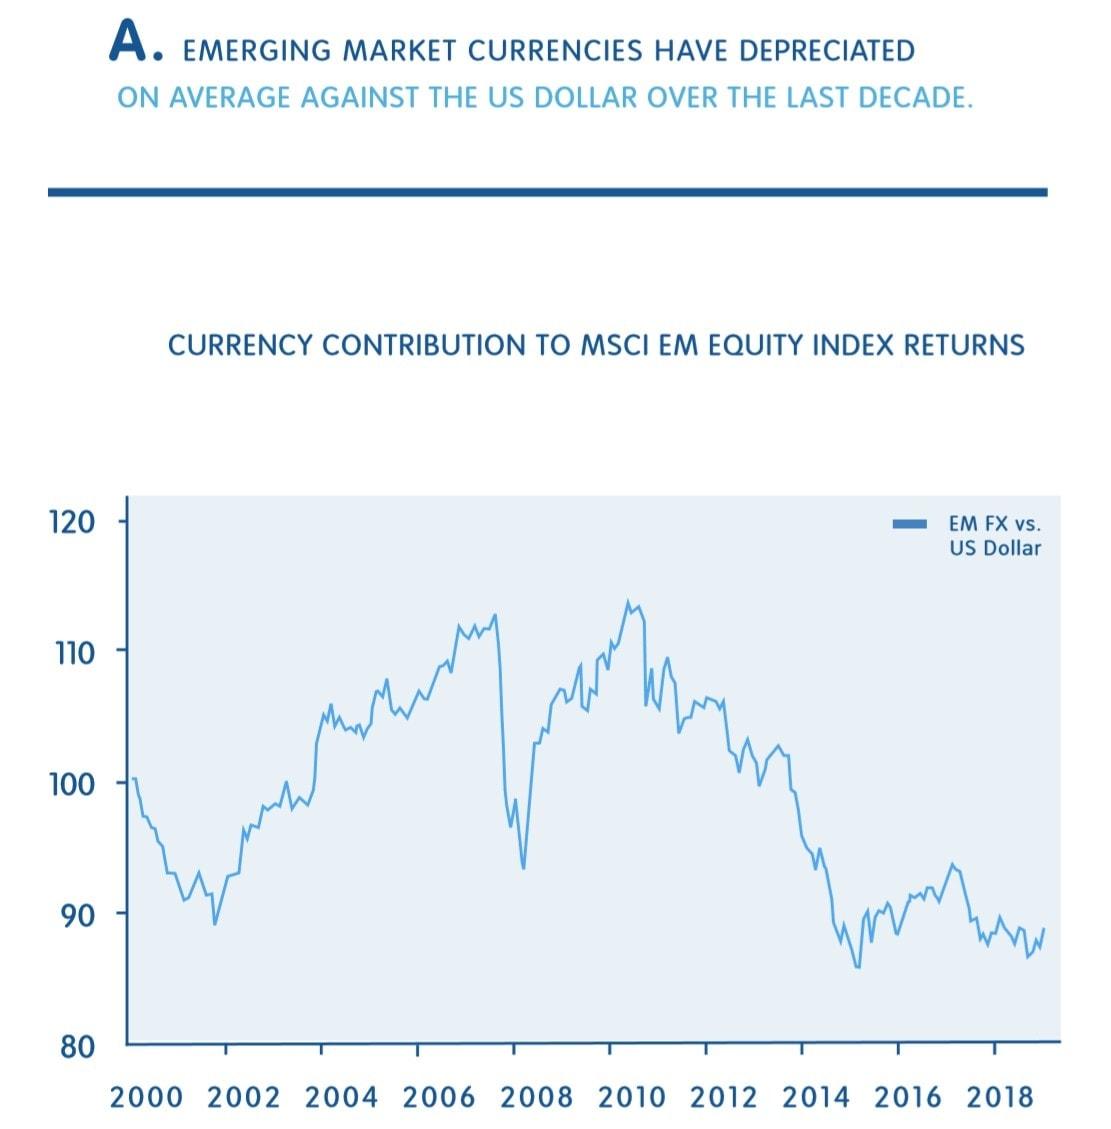 emerging market currencies have depreciated